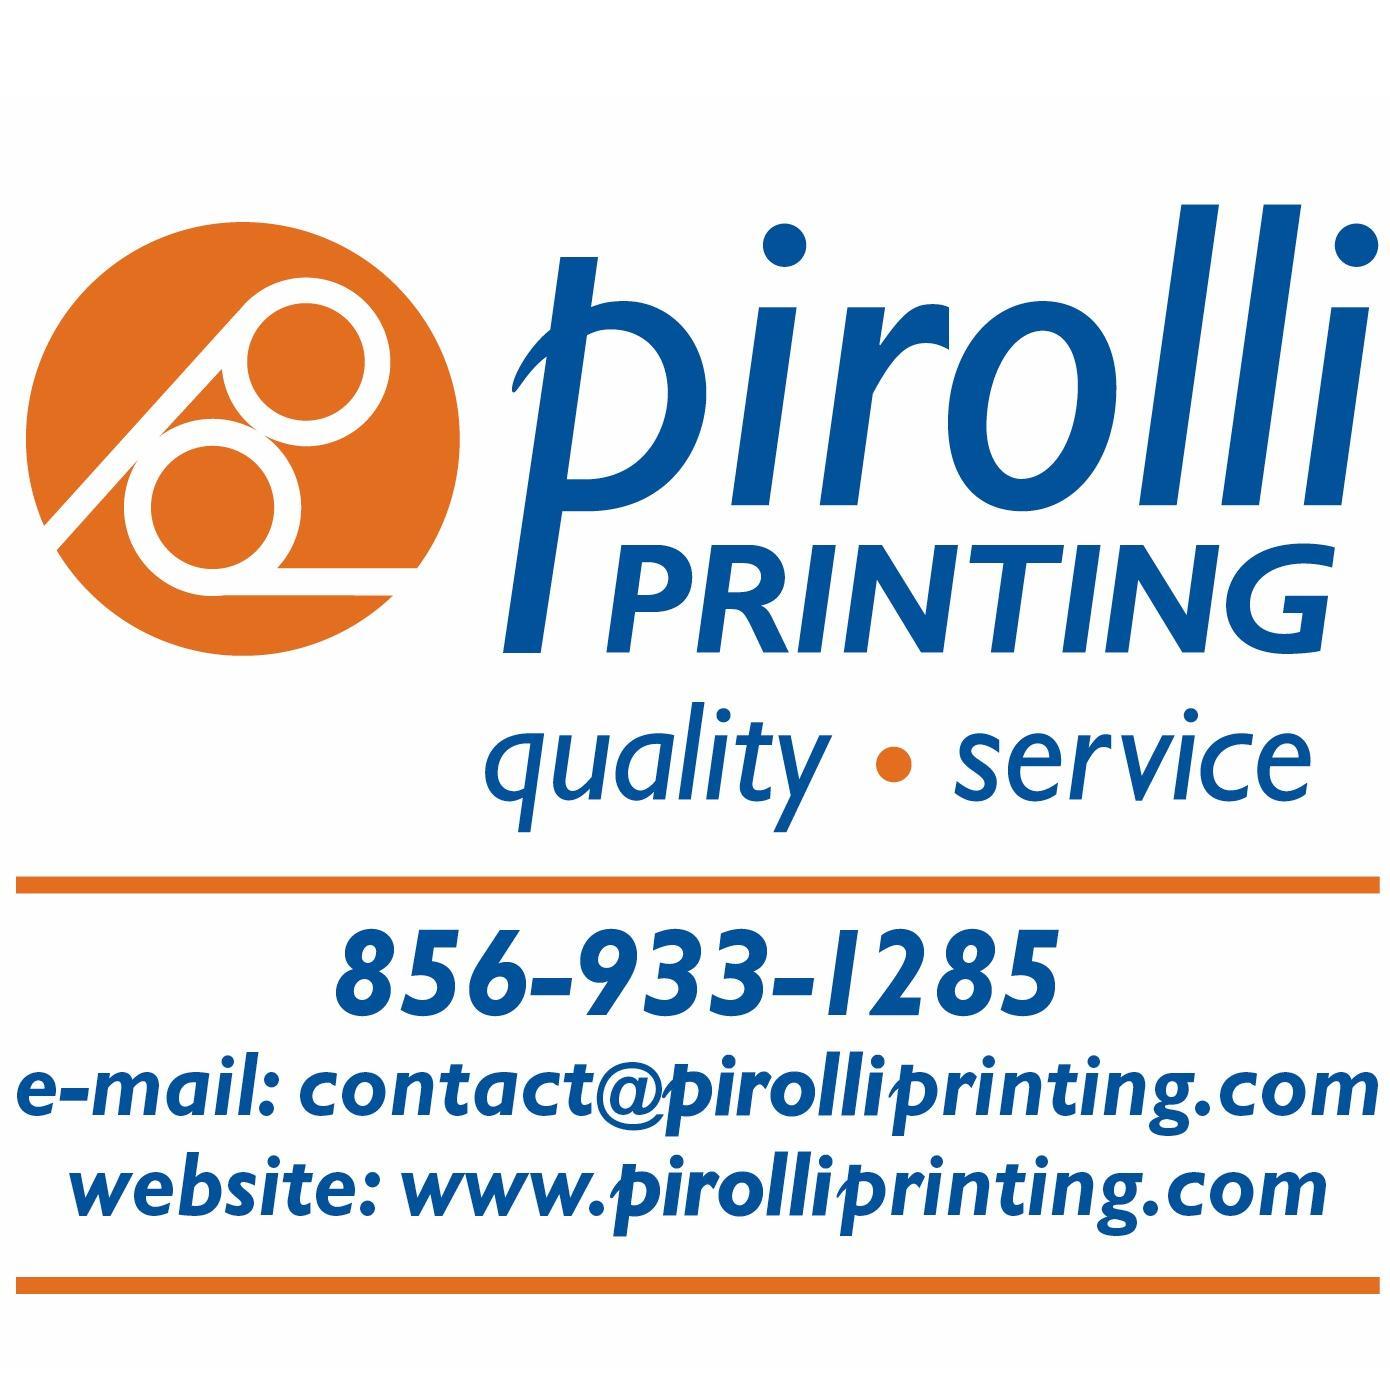 Pirolli Printing Co